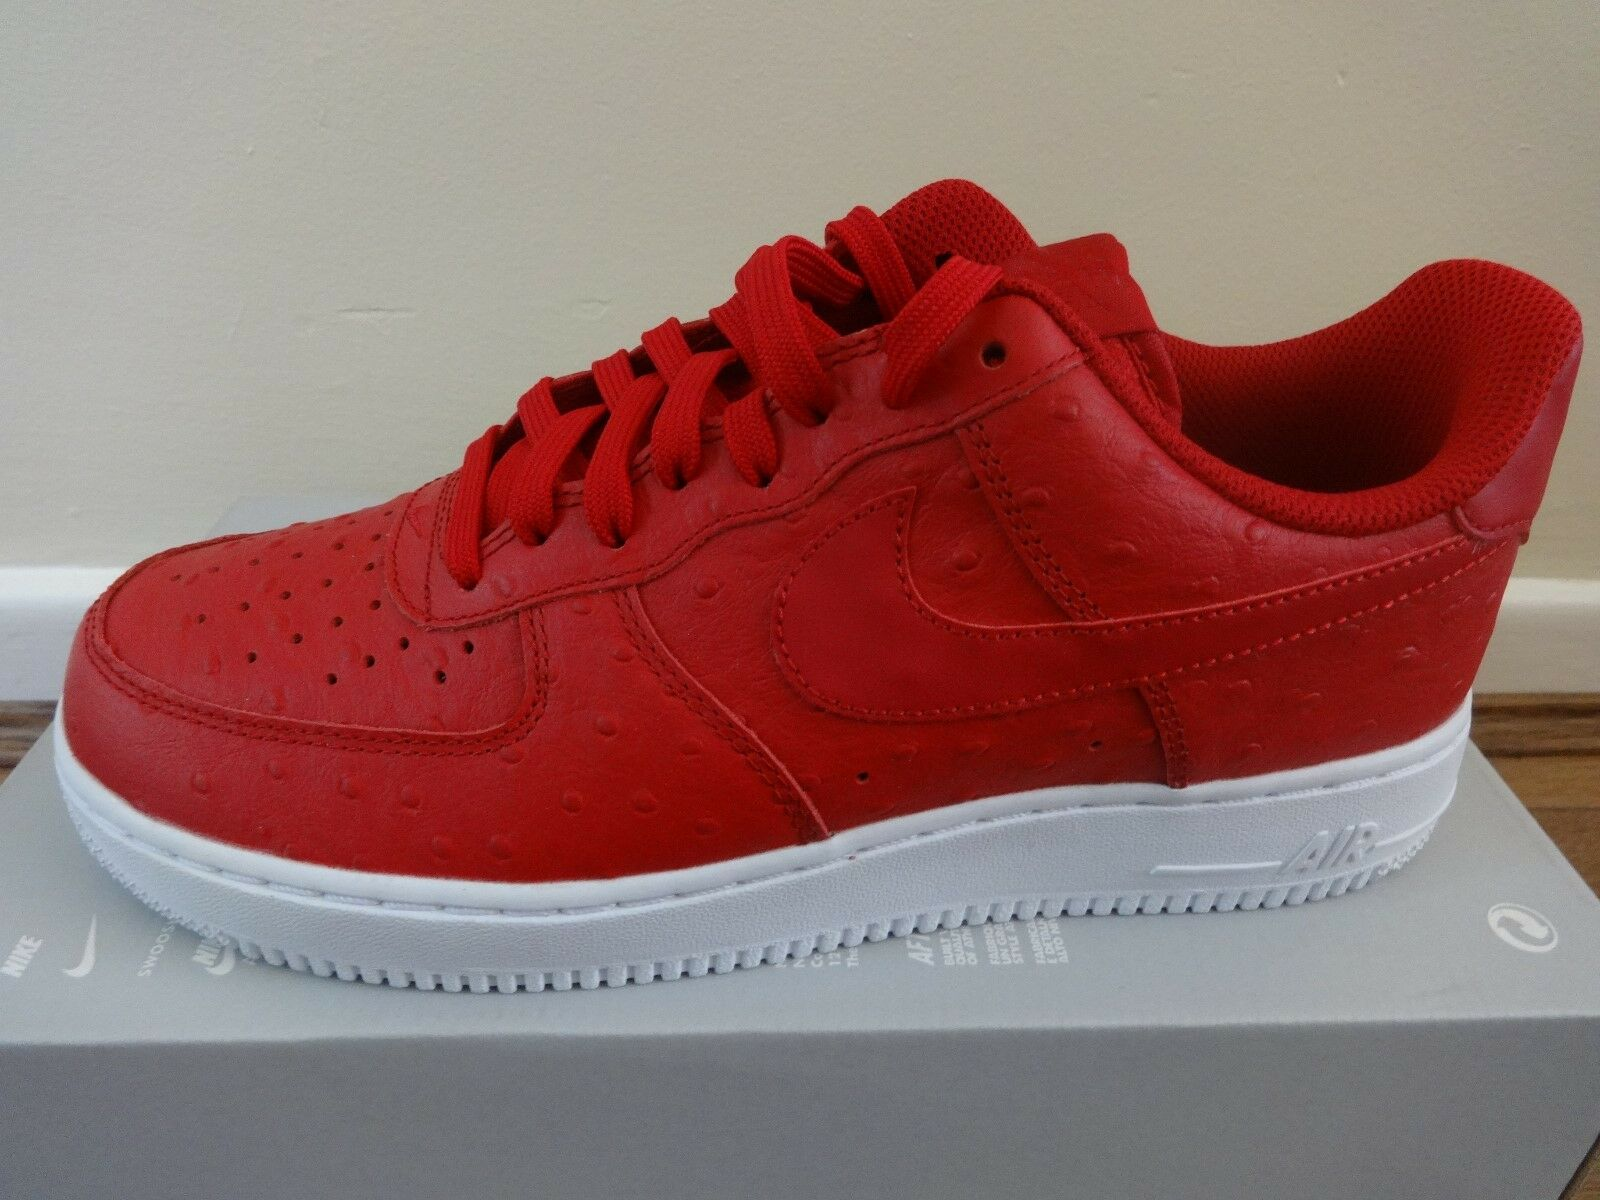 Nike Force Para 1' 07 LV8 Air Para Force Hombres Tenis Tenis Zapatos  718152 603 Nuevo  Caja 842c74